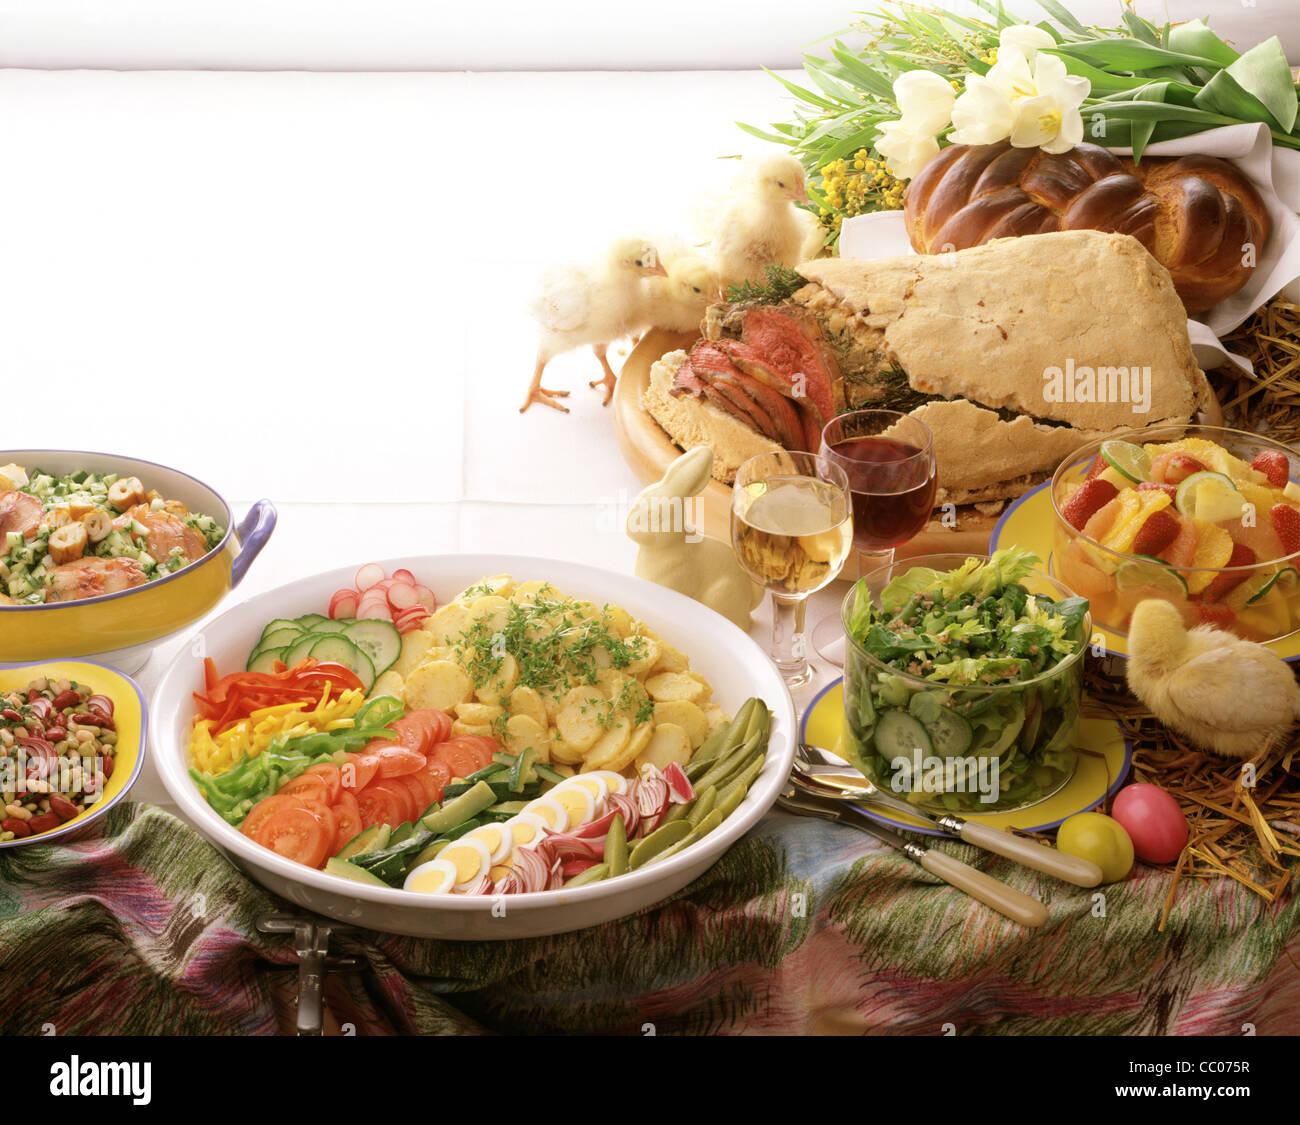 Awe Inspiring Easter Buffet Smoked Fish Salad Bean Salad Roast Beef Interior Design Ideas Lukepblogthenellocom